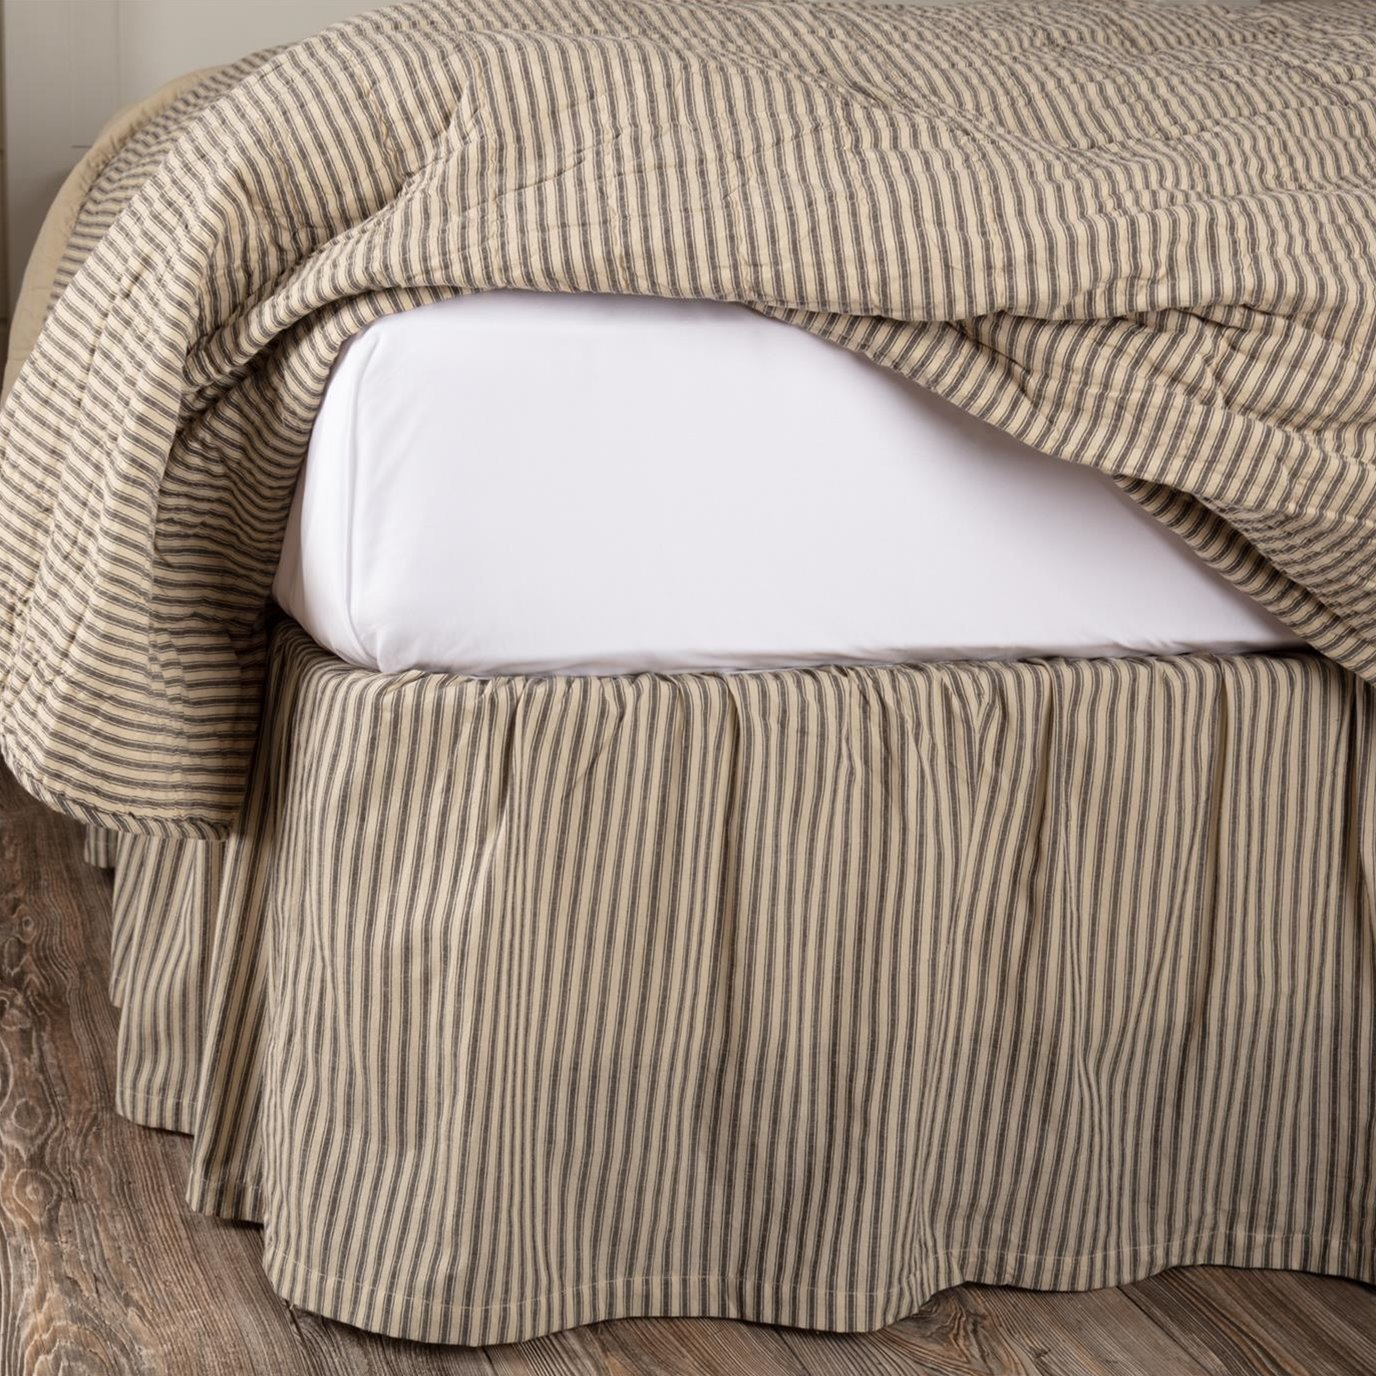 Sawyer Mill Charcoal Ticking Stripe King Bed Skirt 78x80x16